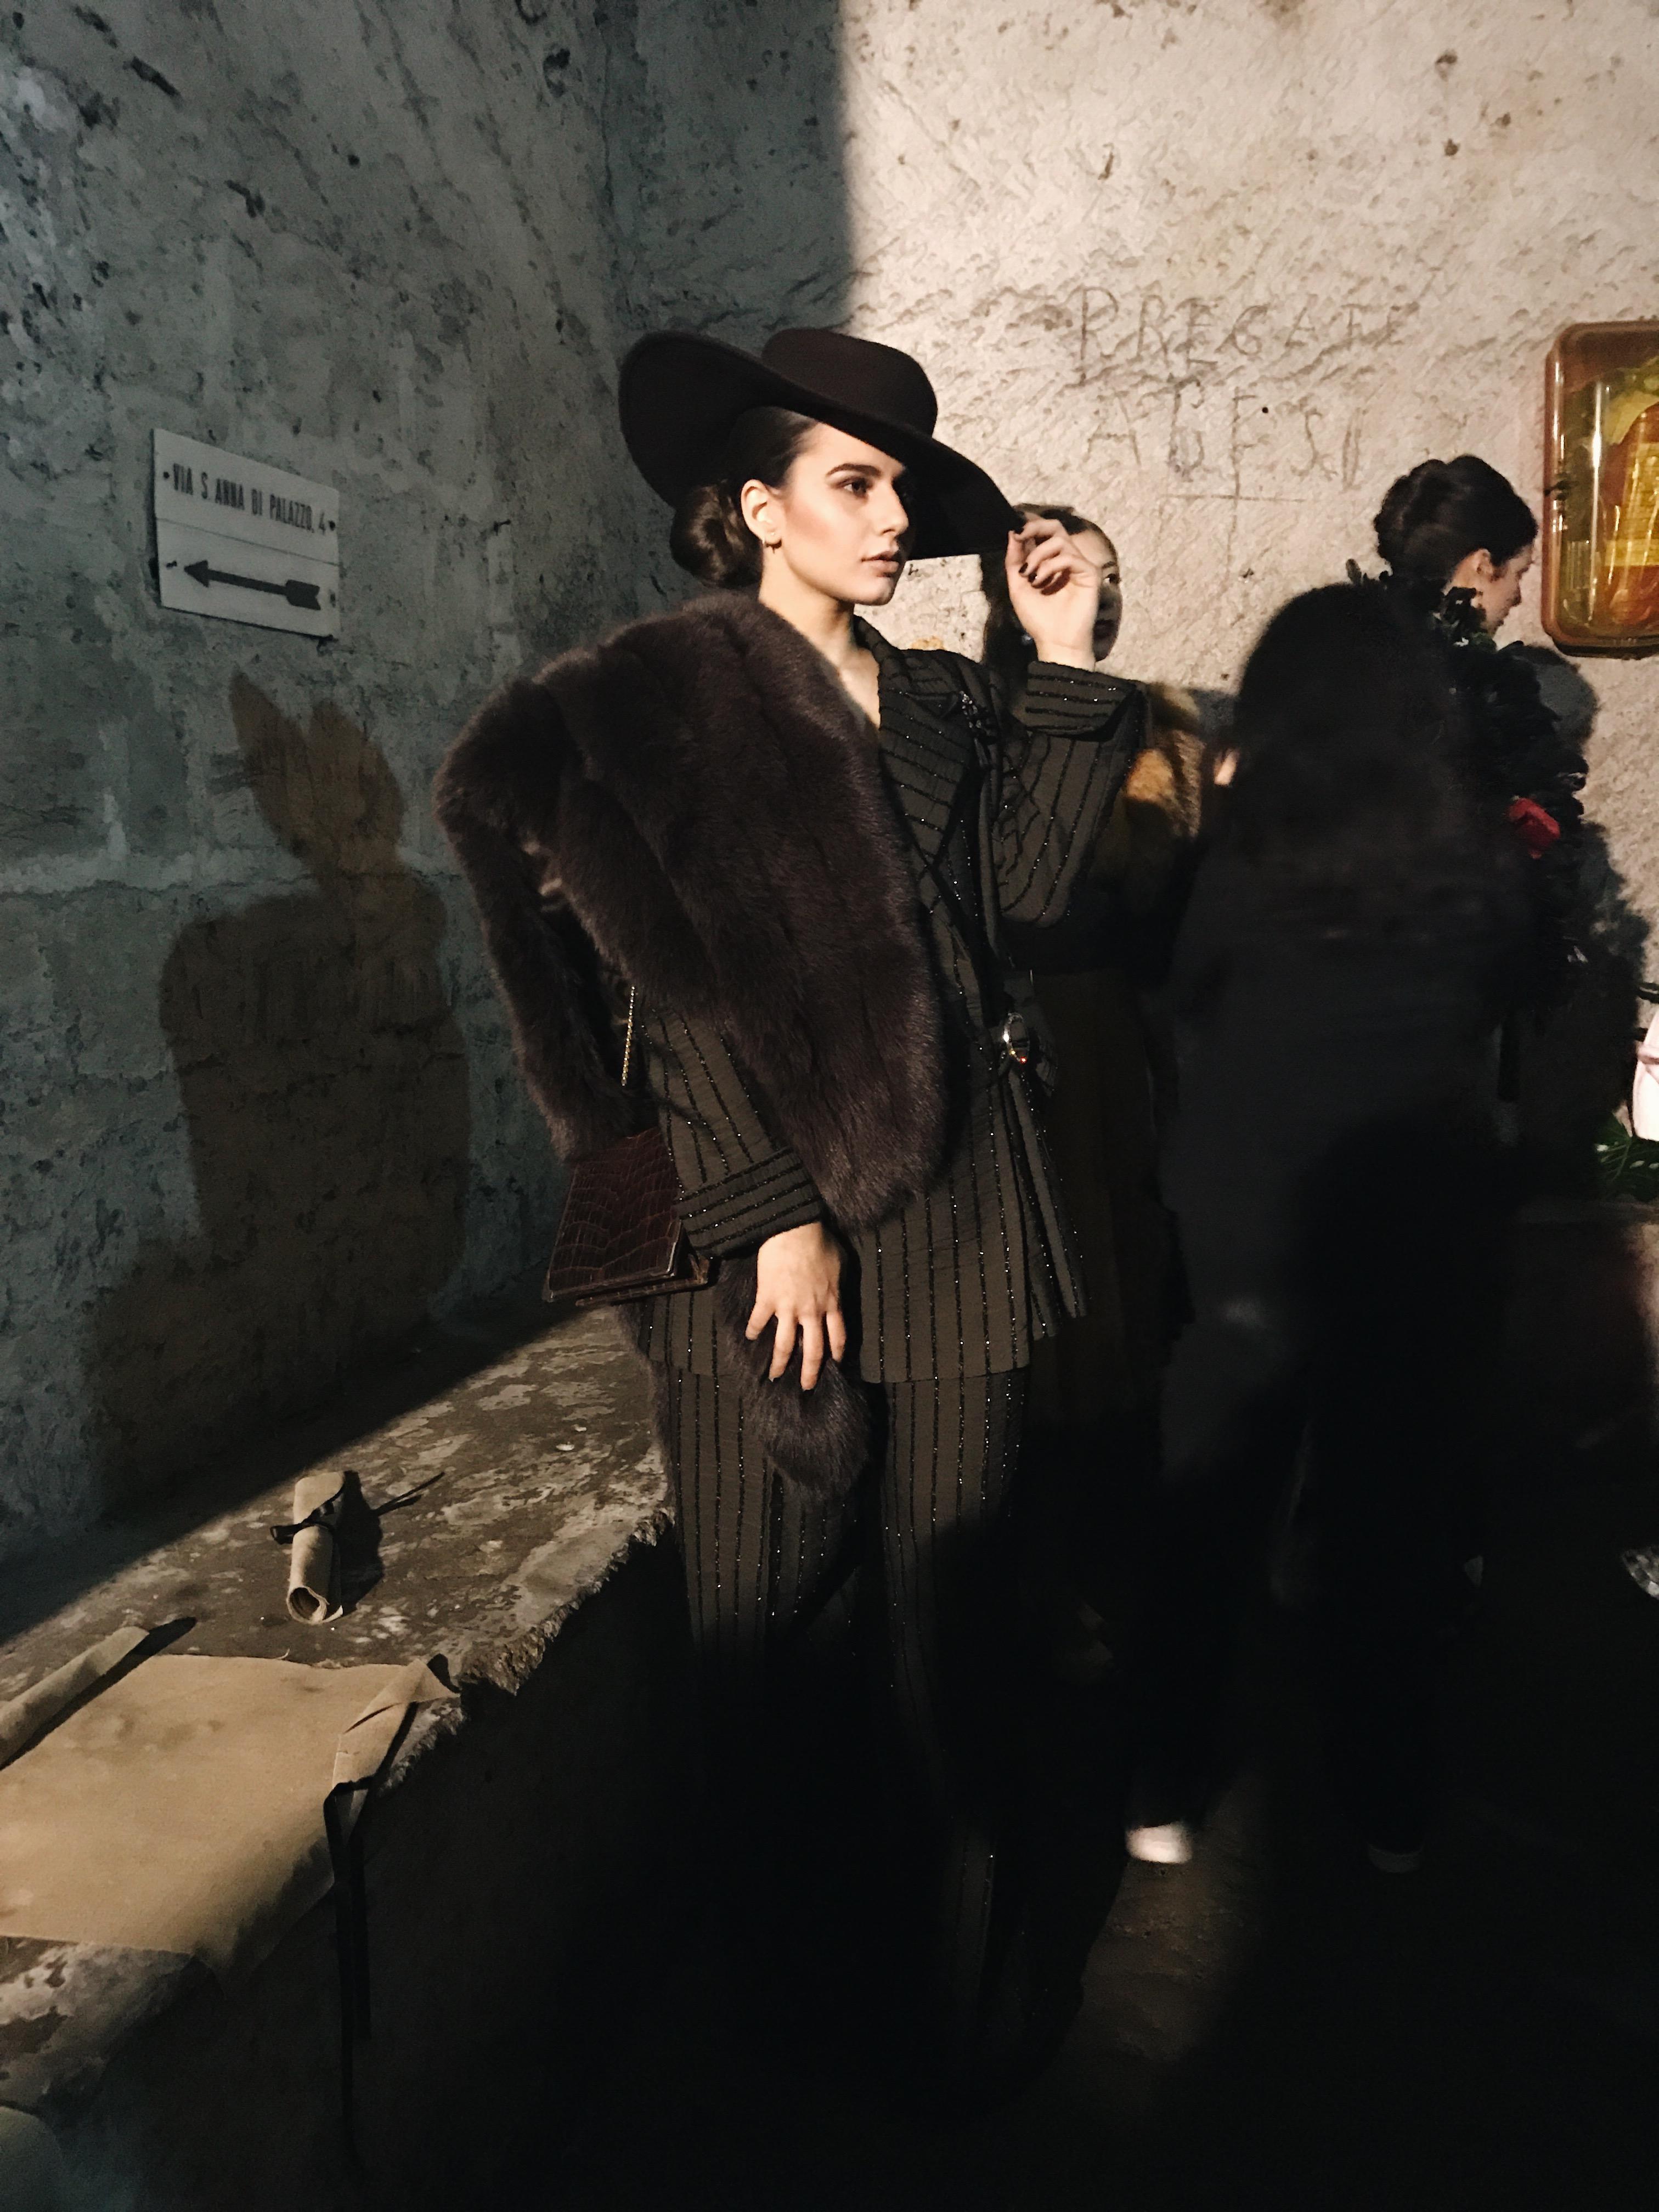 sfilata abiti storici Bencivenga